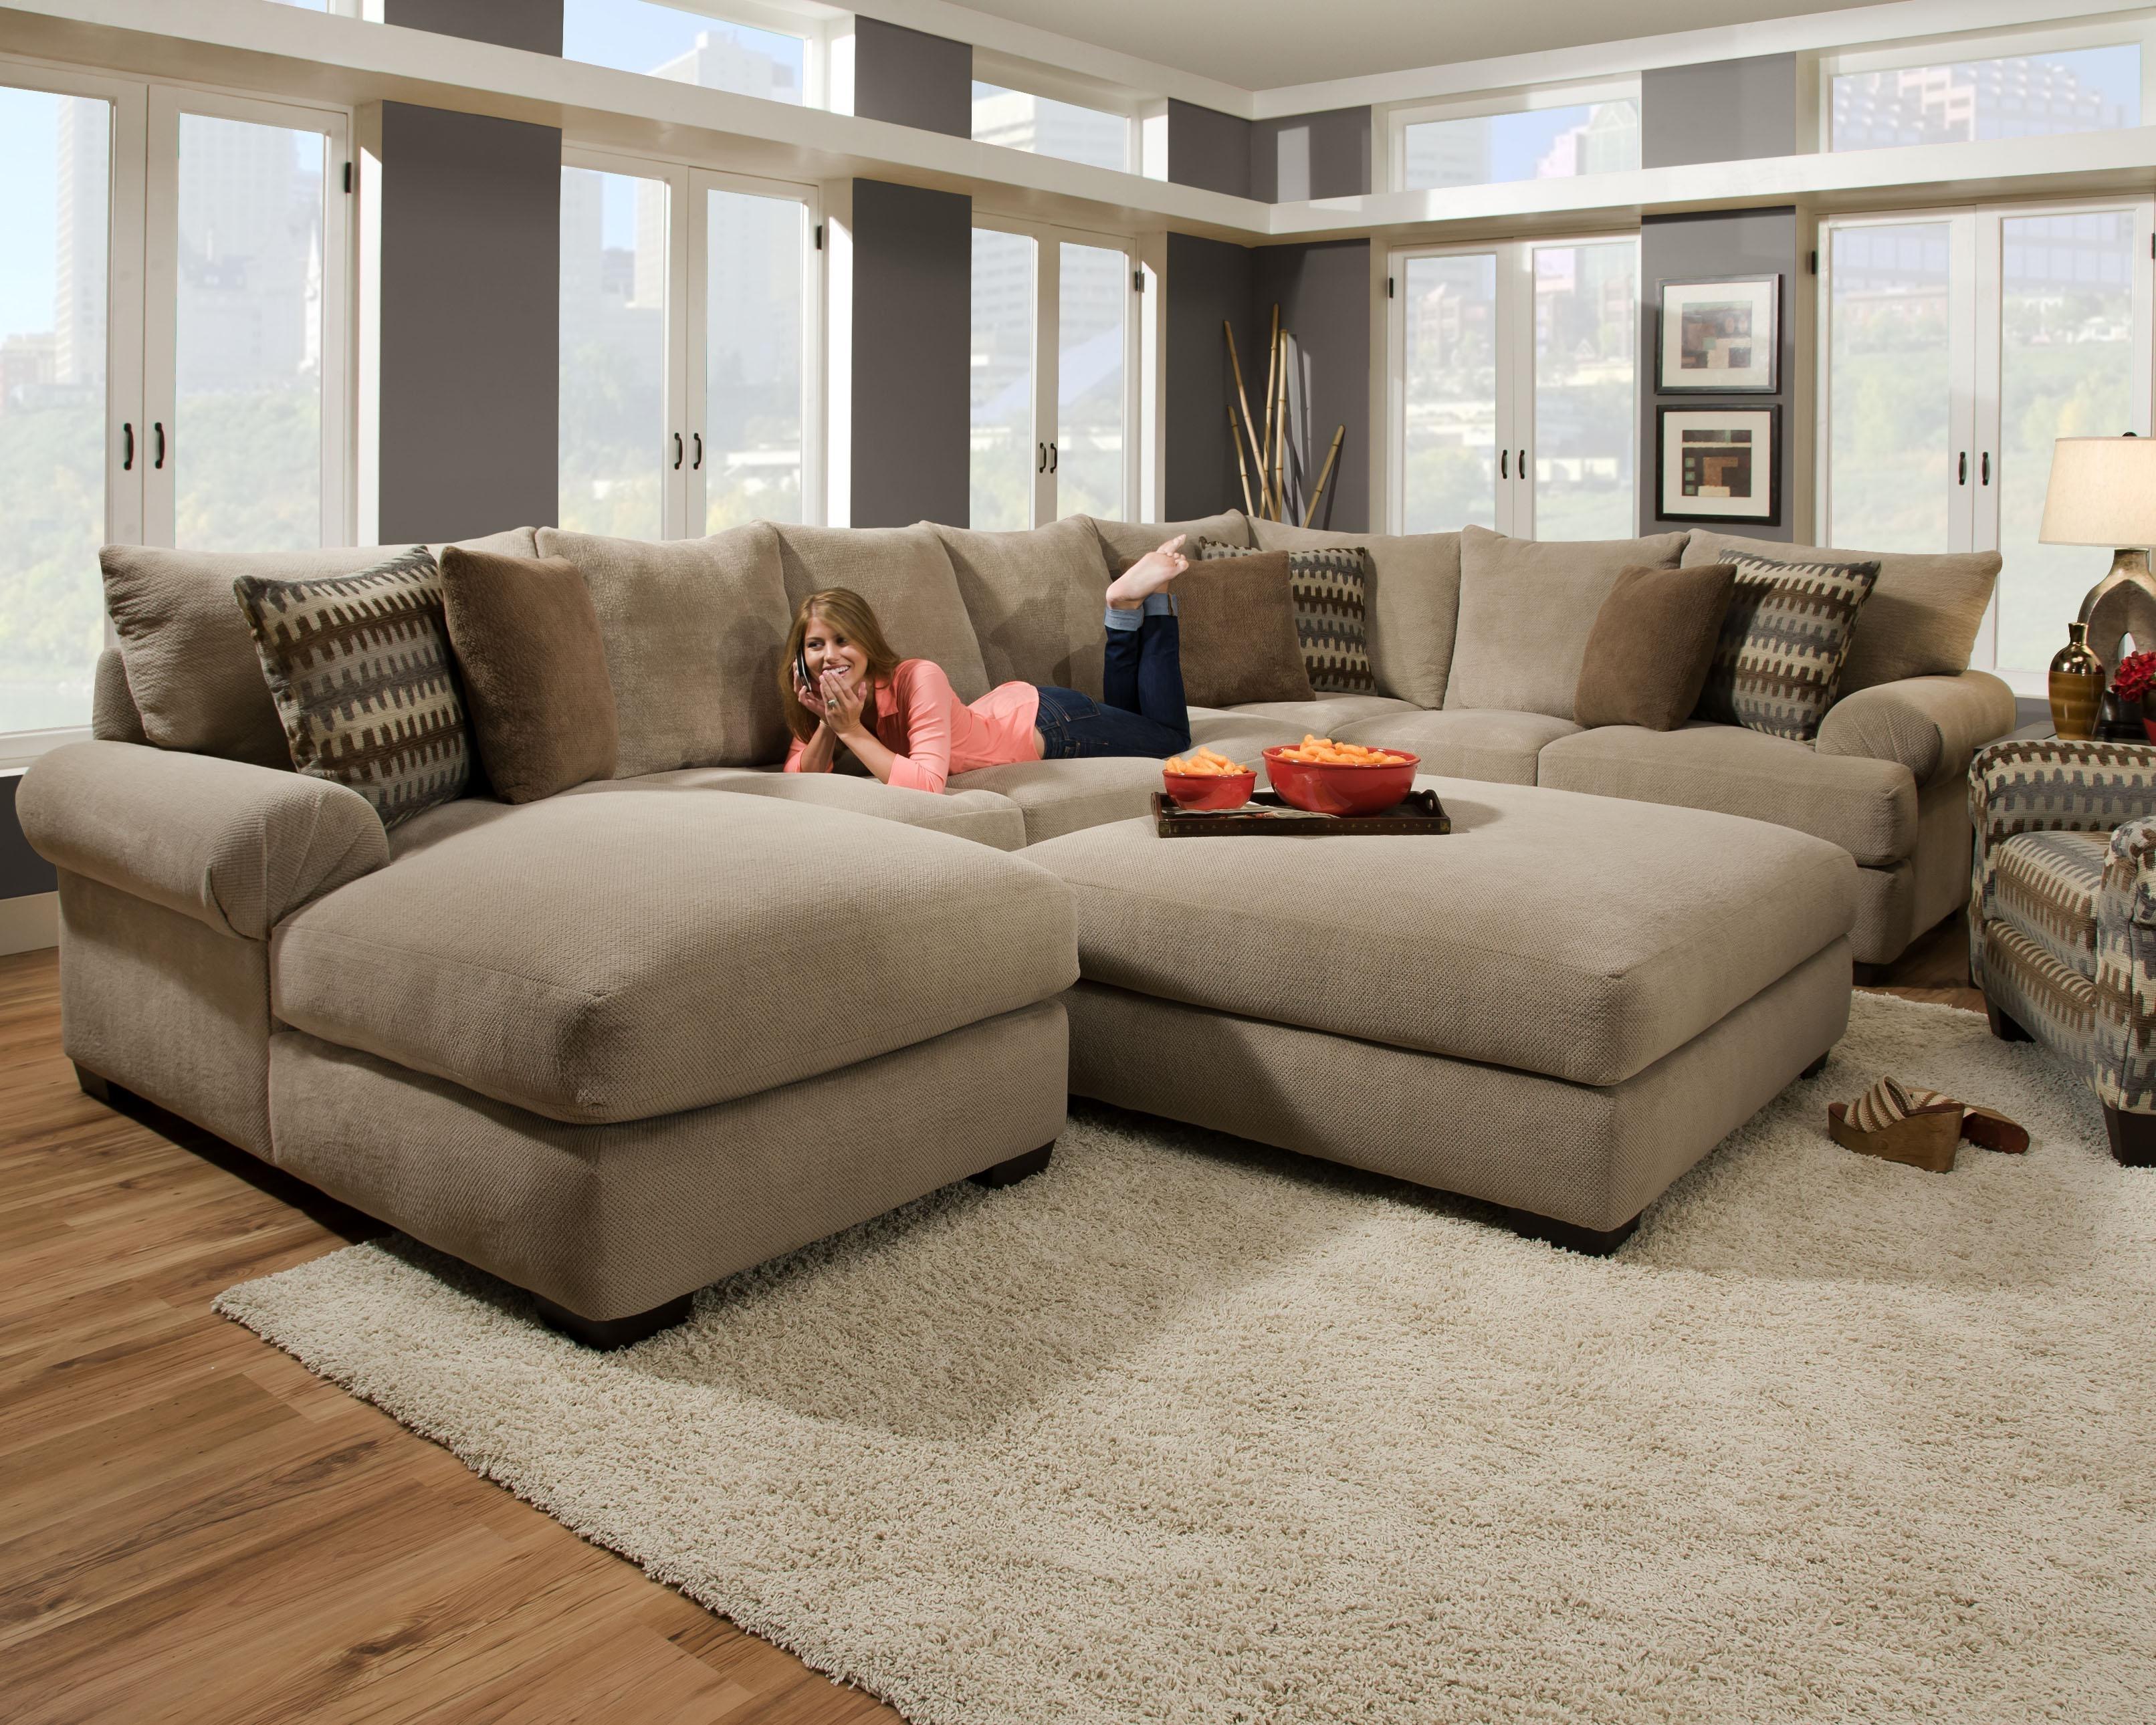 Cheap Sectional Sofas Under 400 | Aifaresidency within Sectional Sofas Under 400 (Image 1 of 15)